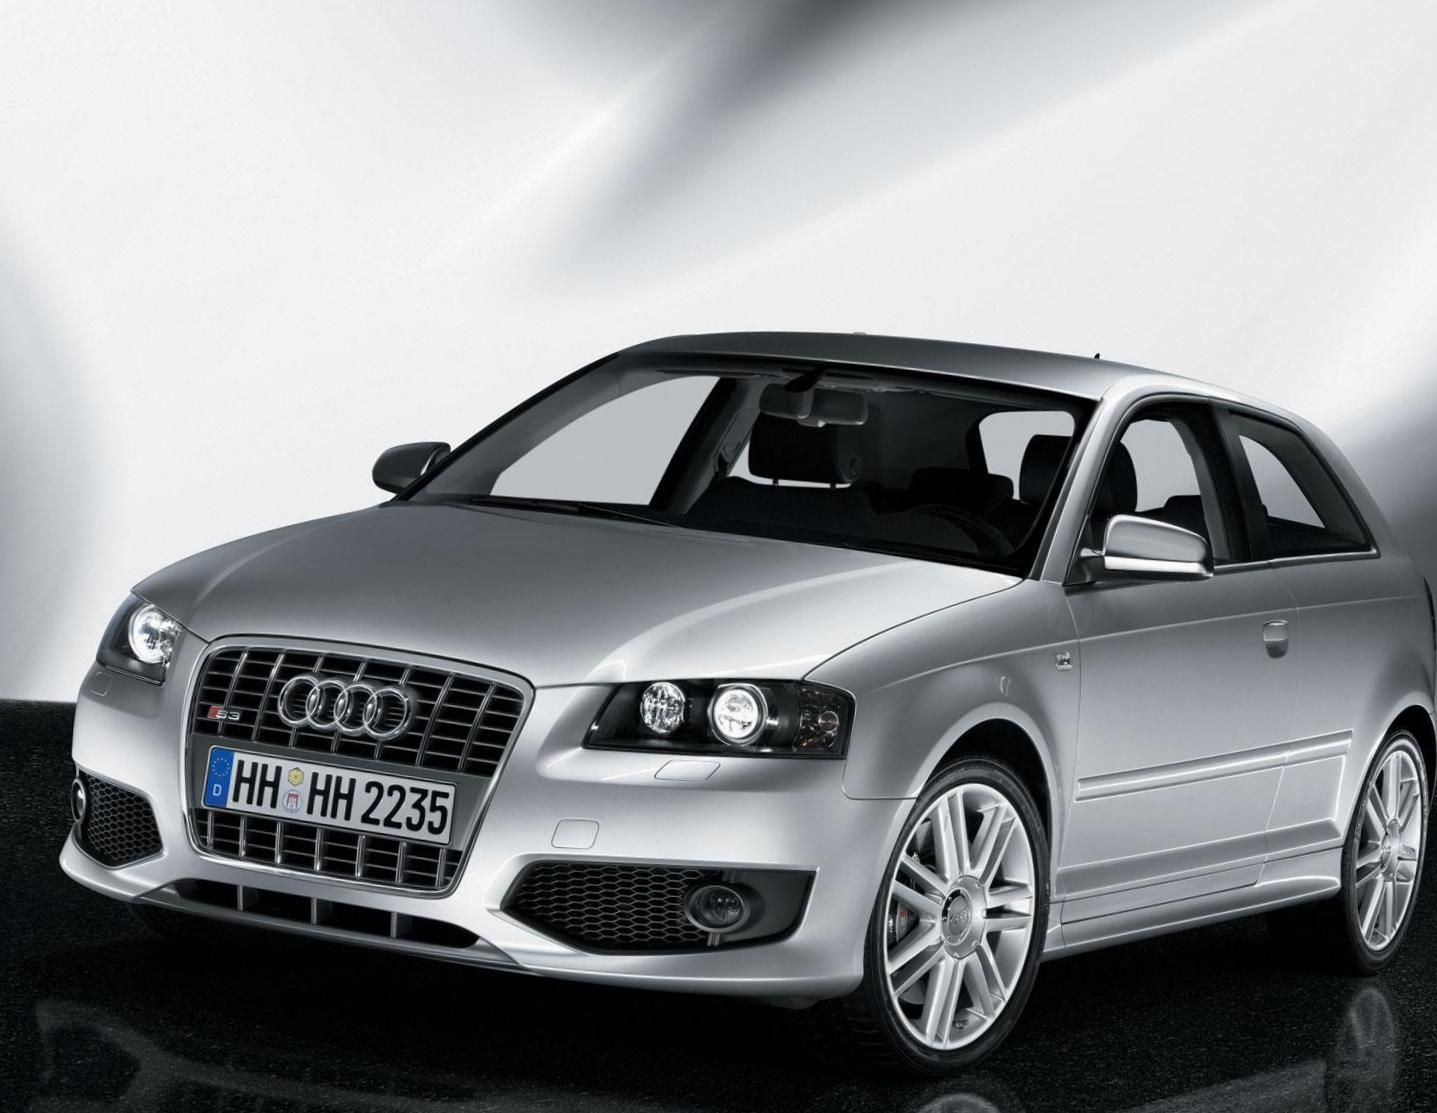 Audi S3 Specification - http://autotras.com